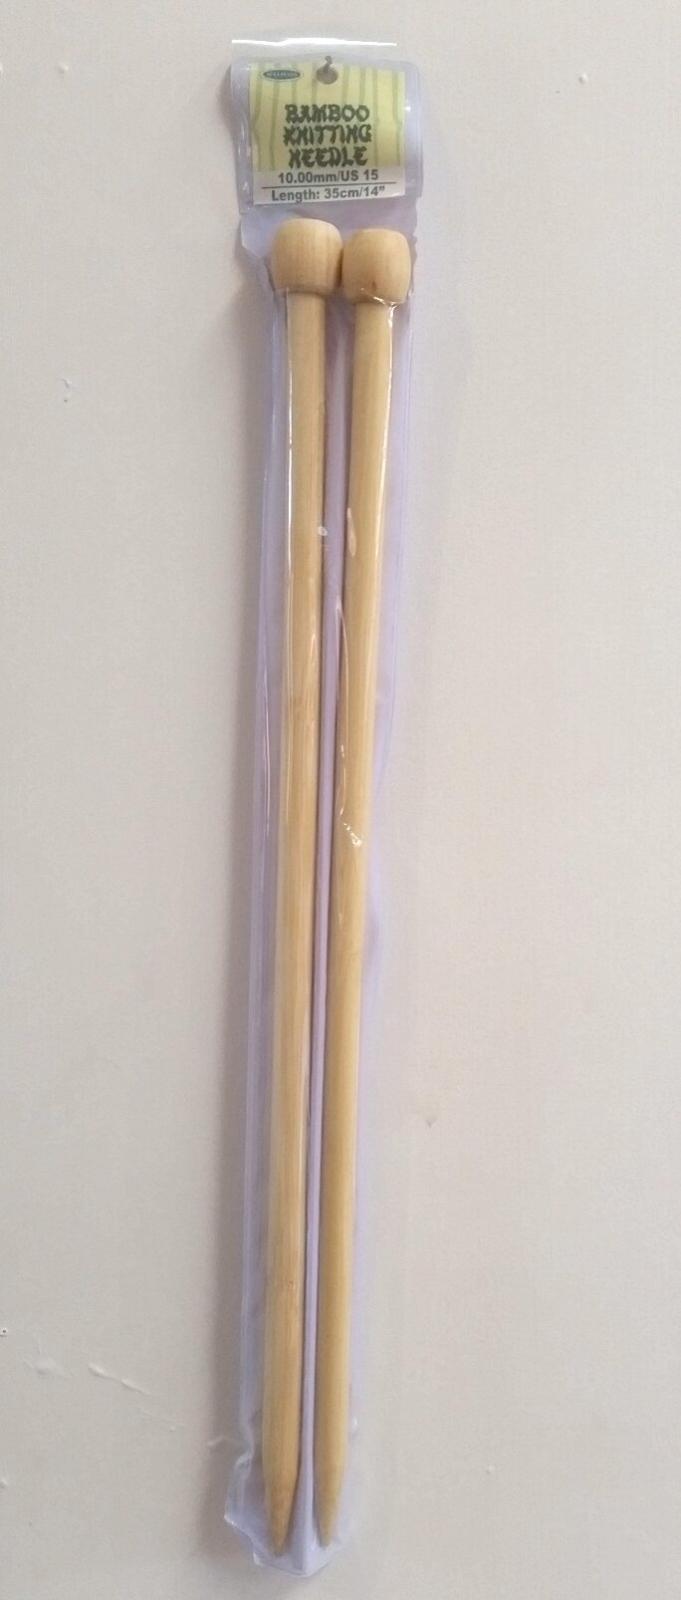 10.00mm Bamboo Needles 35cm